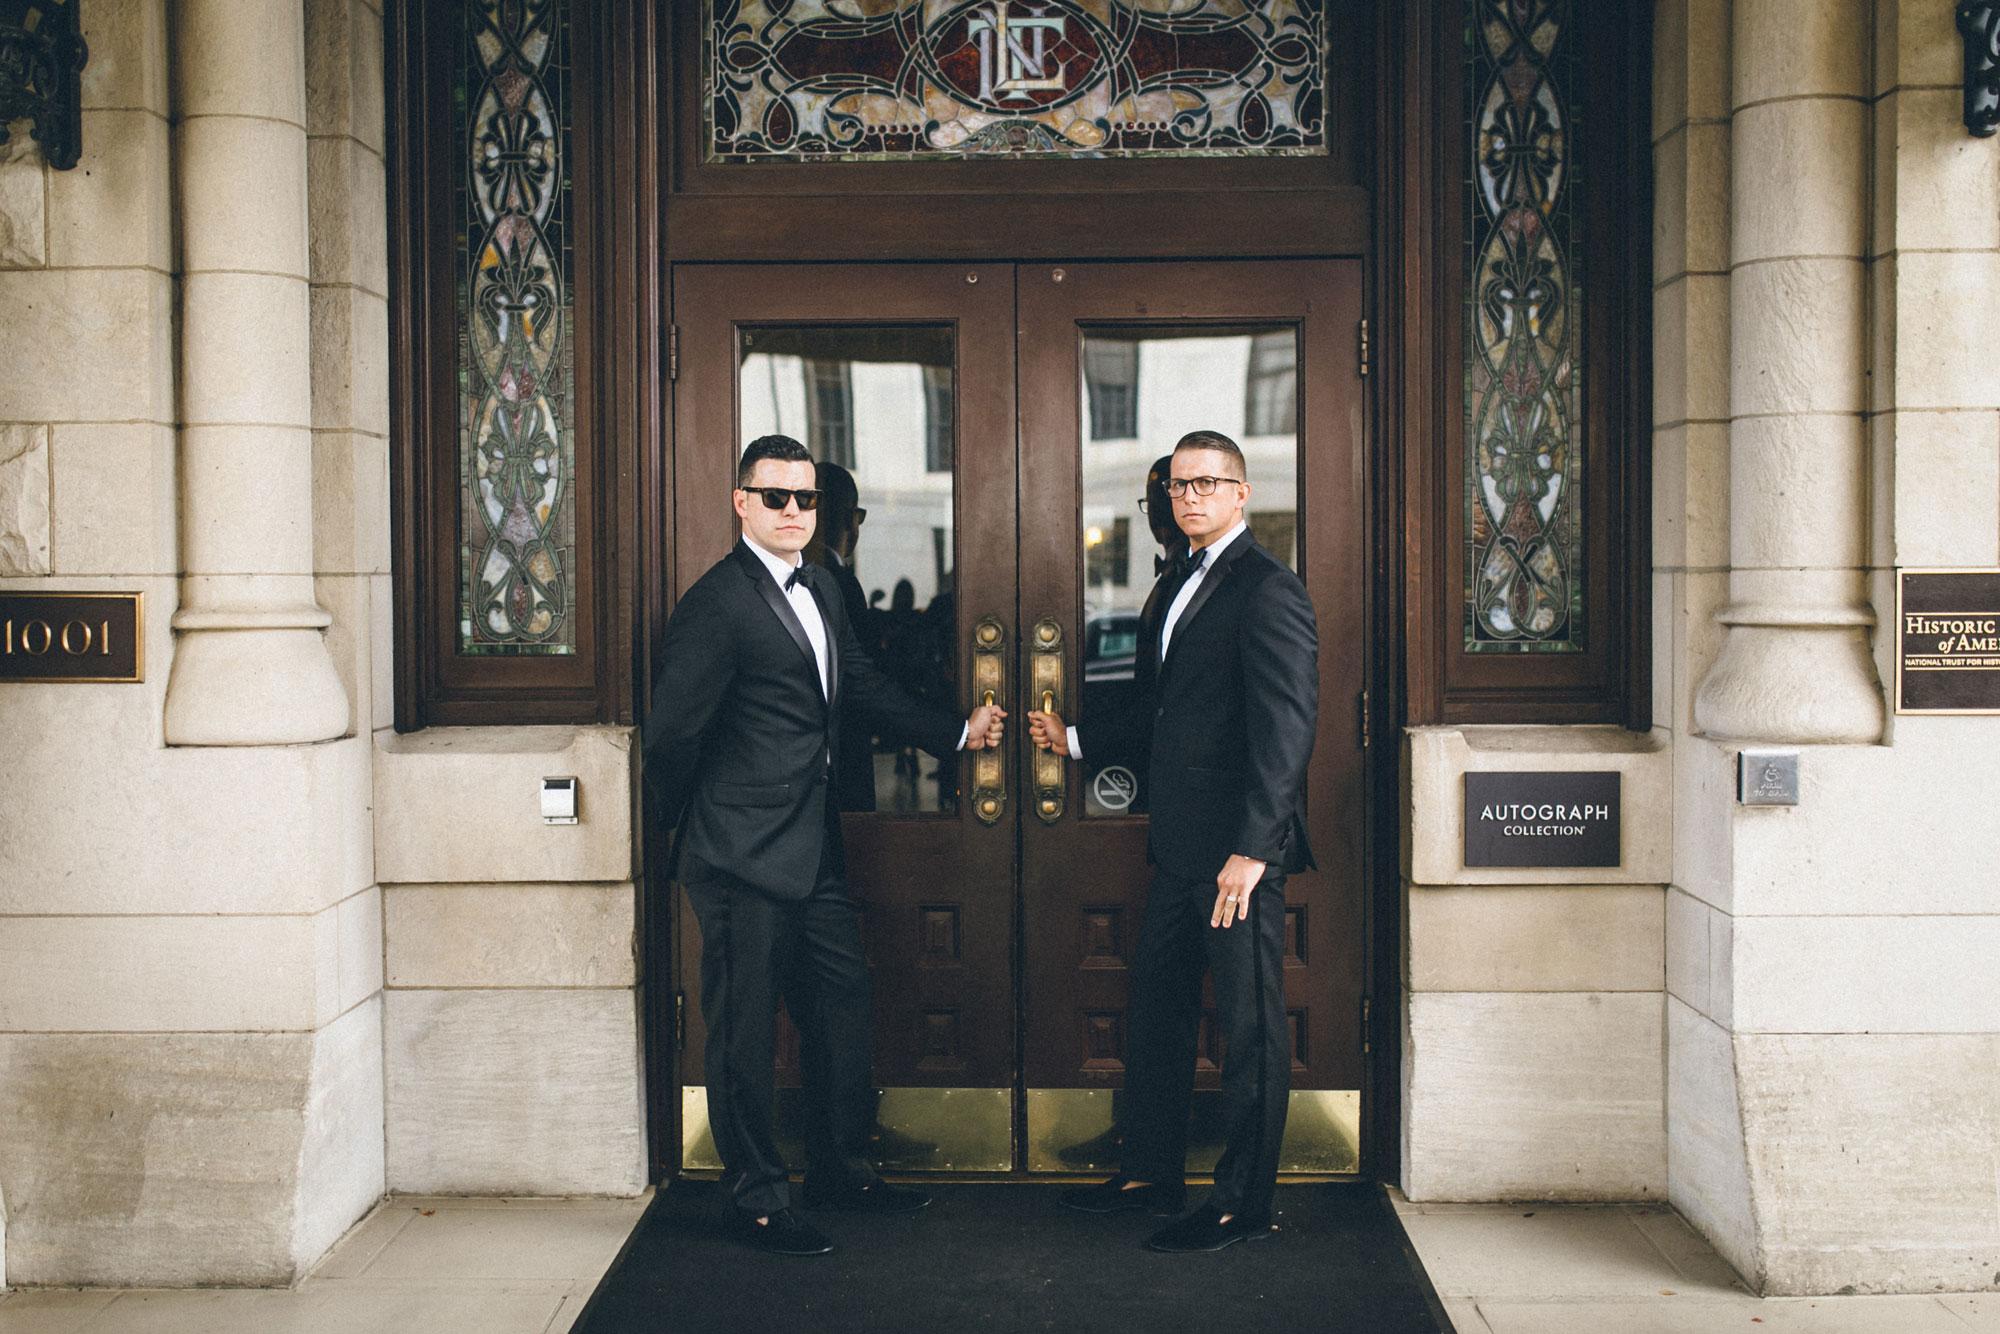 Me & Mr. Jones Wedding, First Look at Union Station Hotel, Nashville Wedding